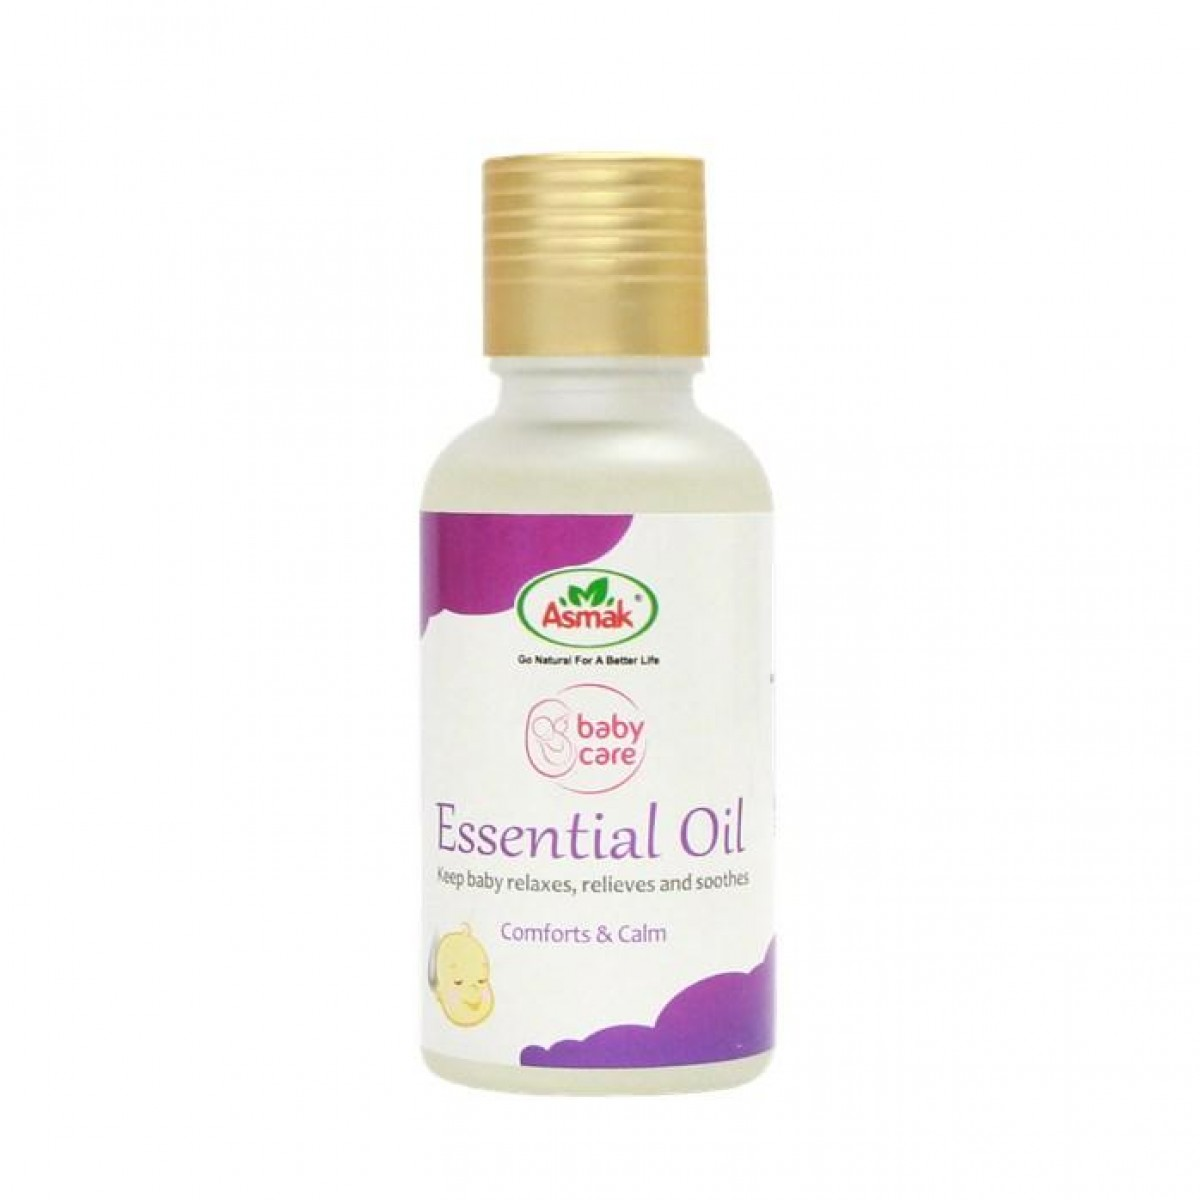 Asmak-Essencial Oil-30ml - Kico Baby Center